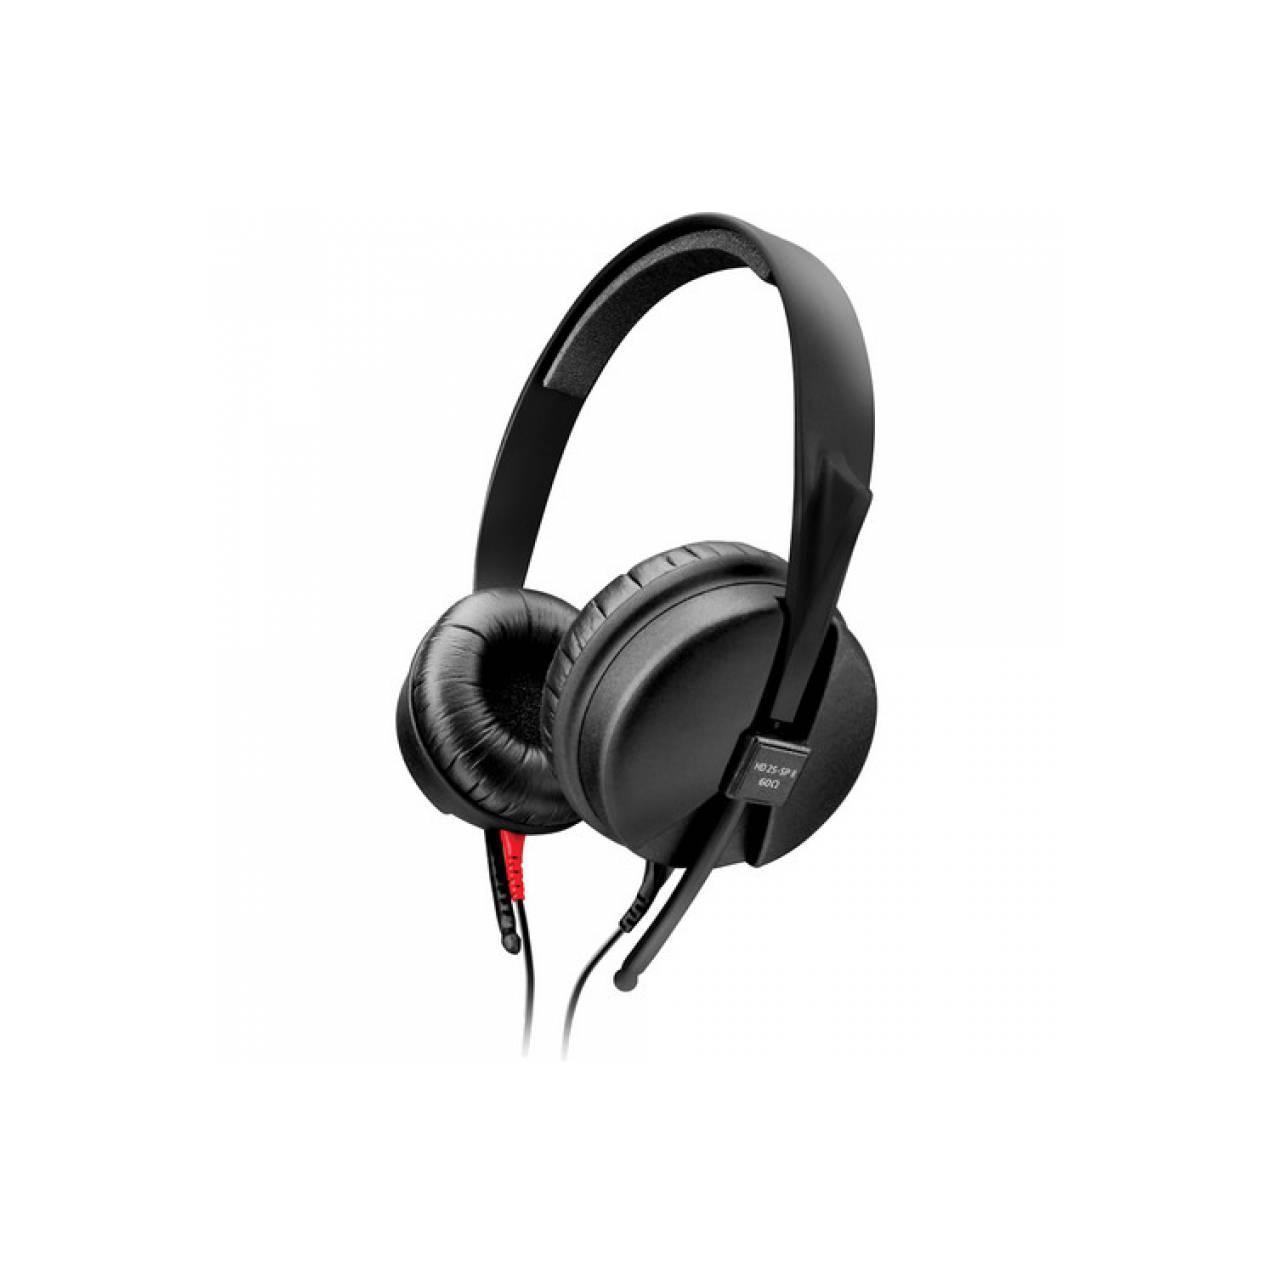 Buy Sell Cheapest Ear Monitor Sennheiser Best Quality Product Hd 280 Pro Headphone Hitam Hd25spii Full Sized Stereo Studio Headphones